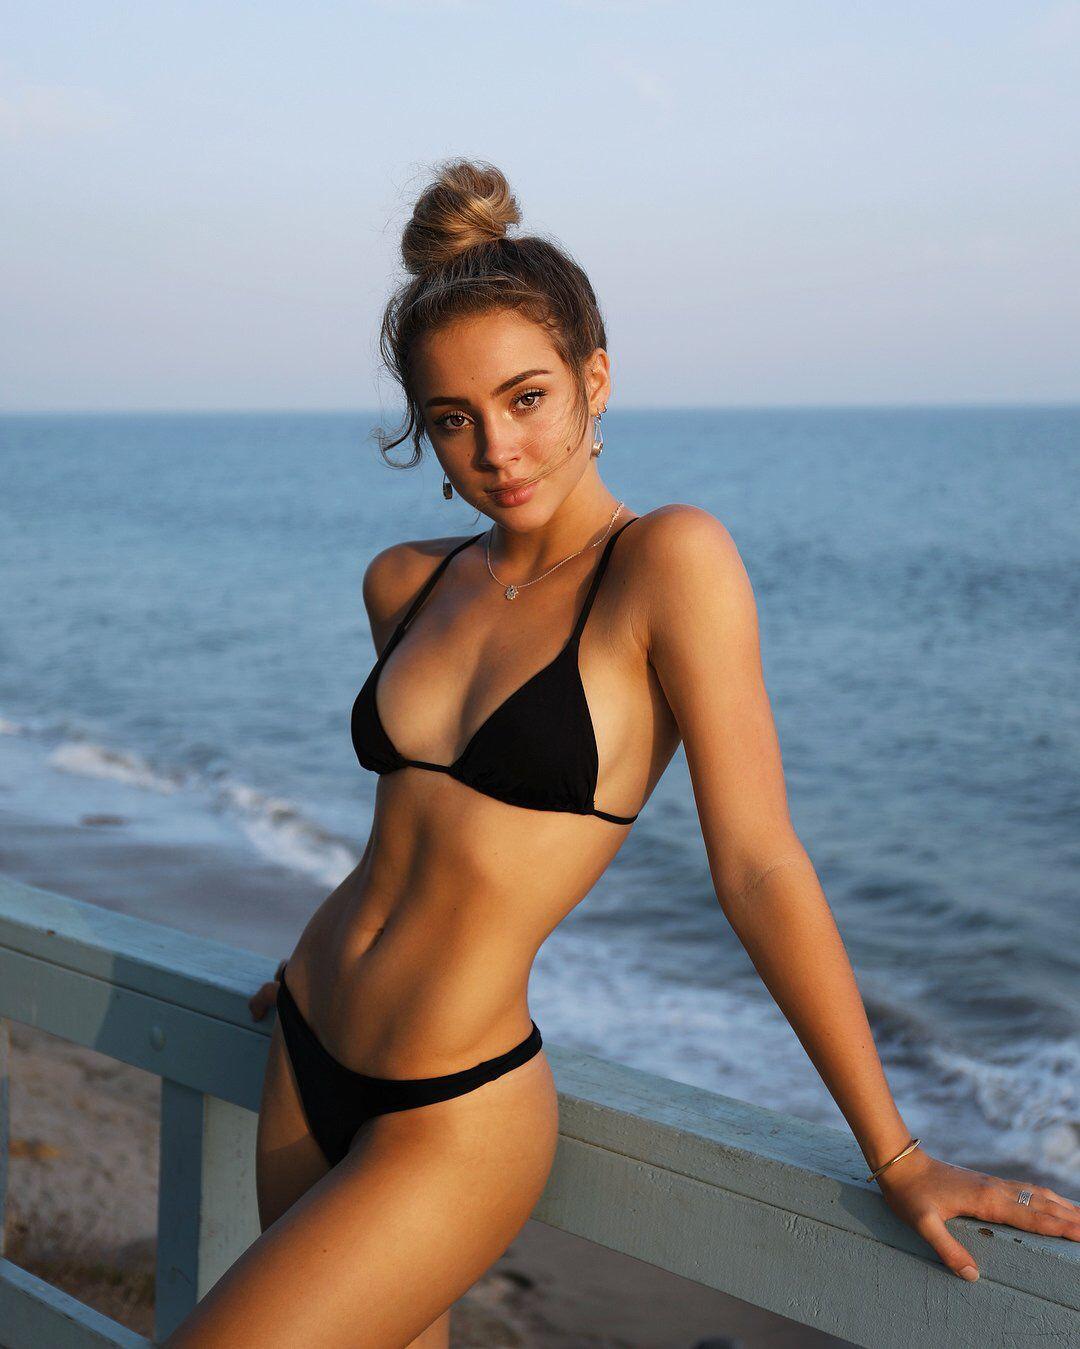 Bikini Shanna McLaughlin naked (33 foto and video), Tits, Sideboobs, Twitter, butt 2018